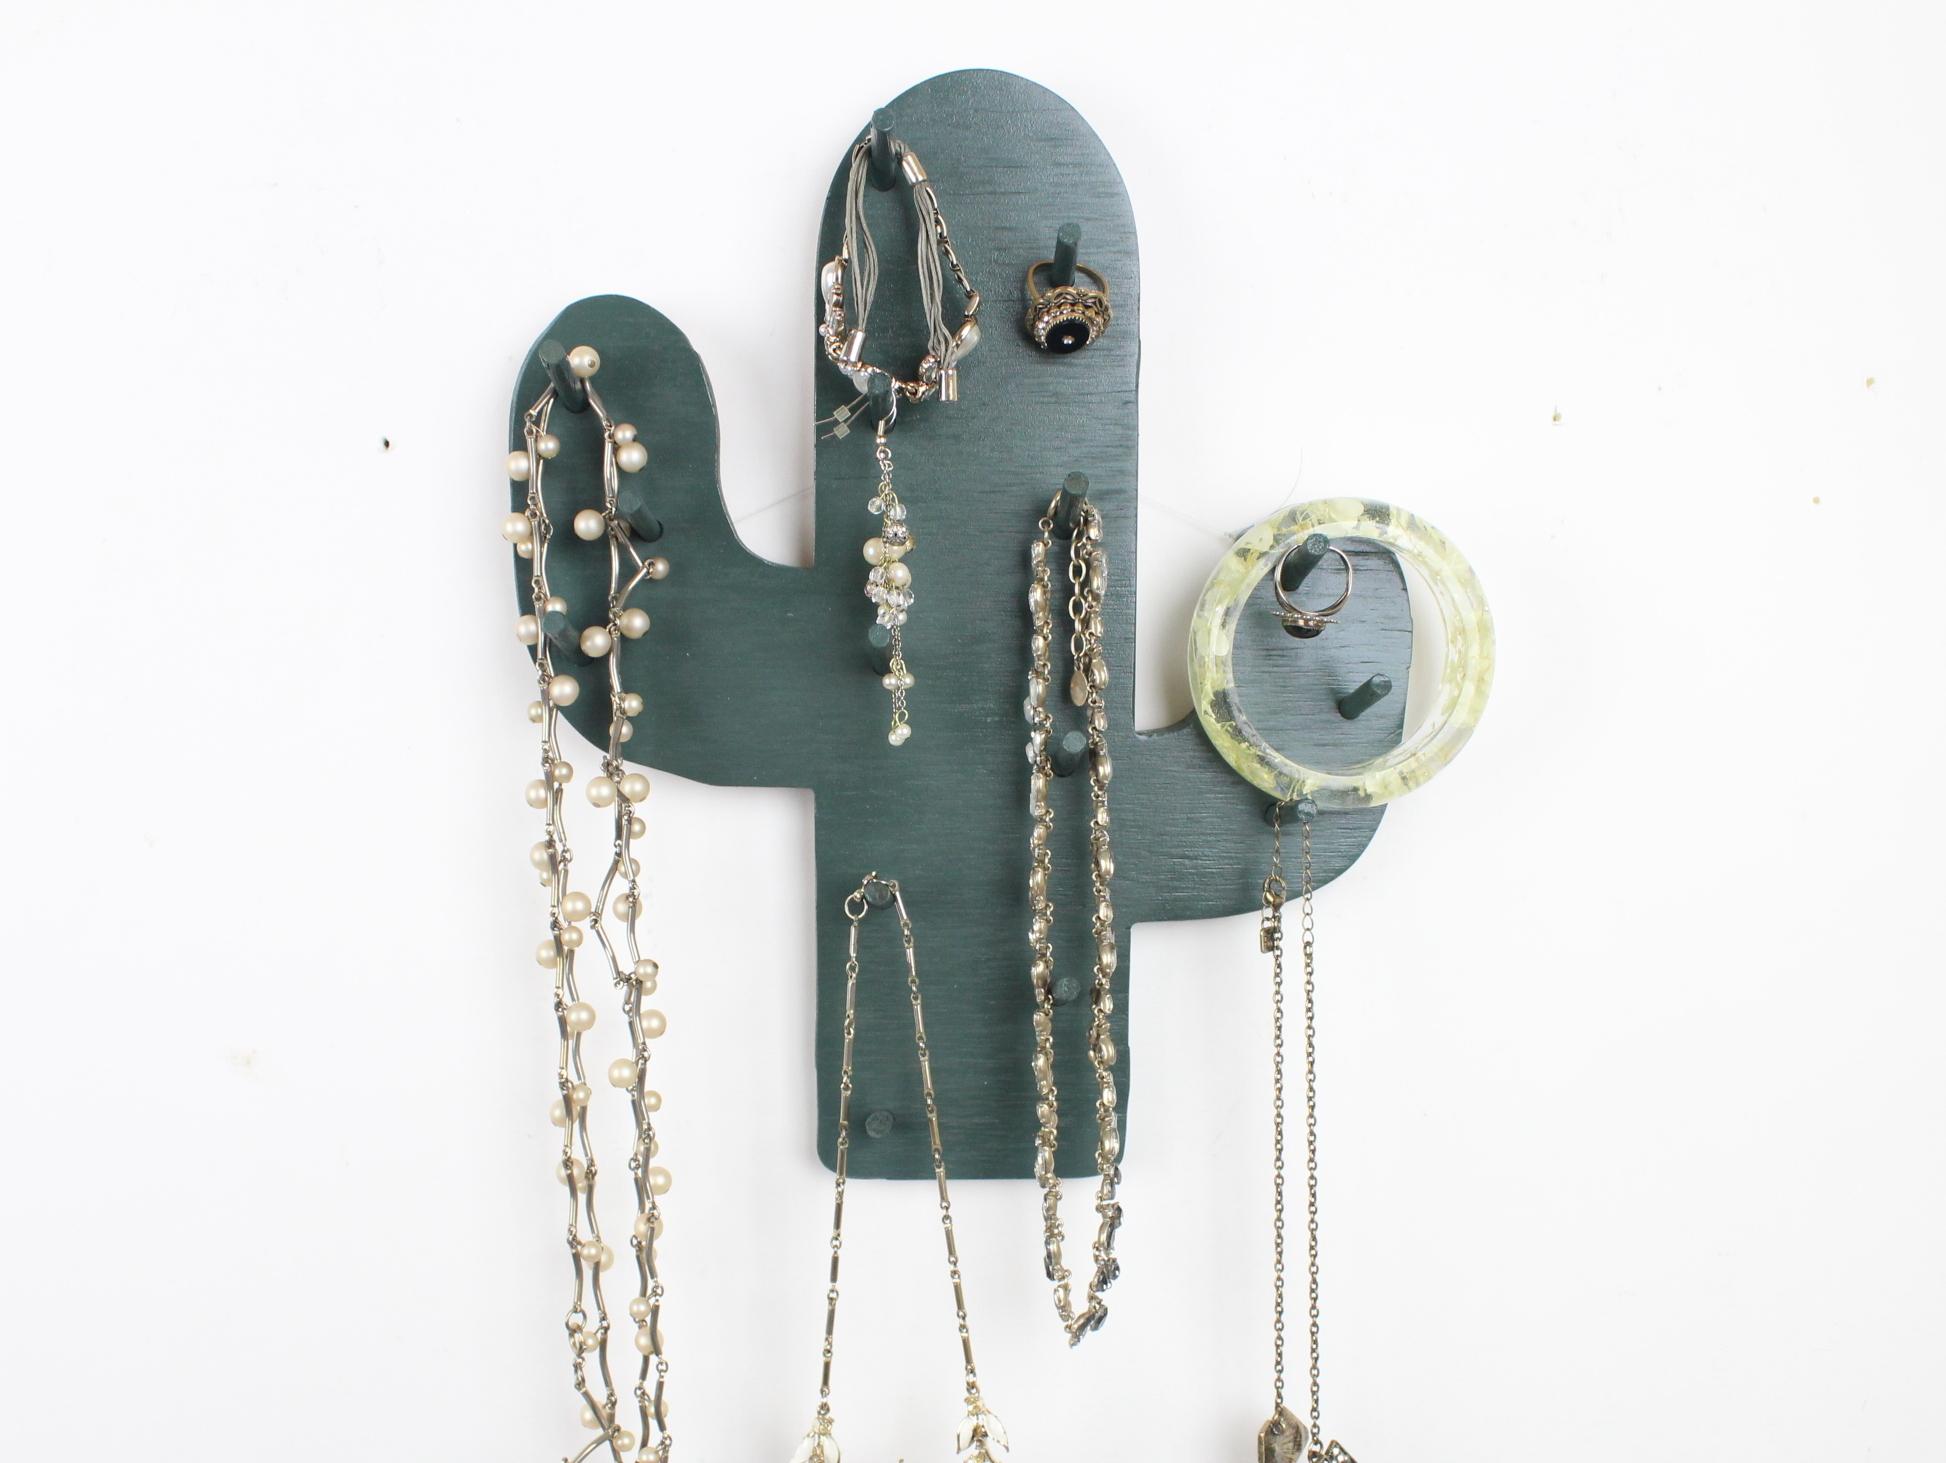 Cactus Necklace Holder